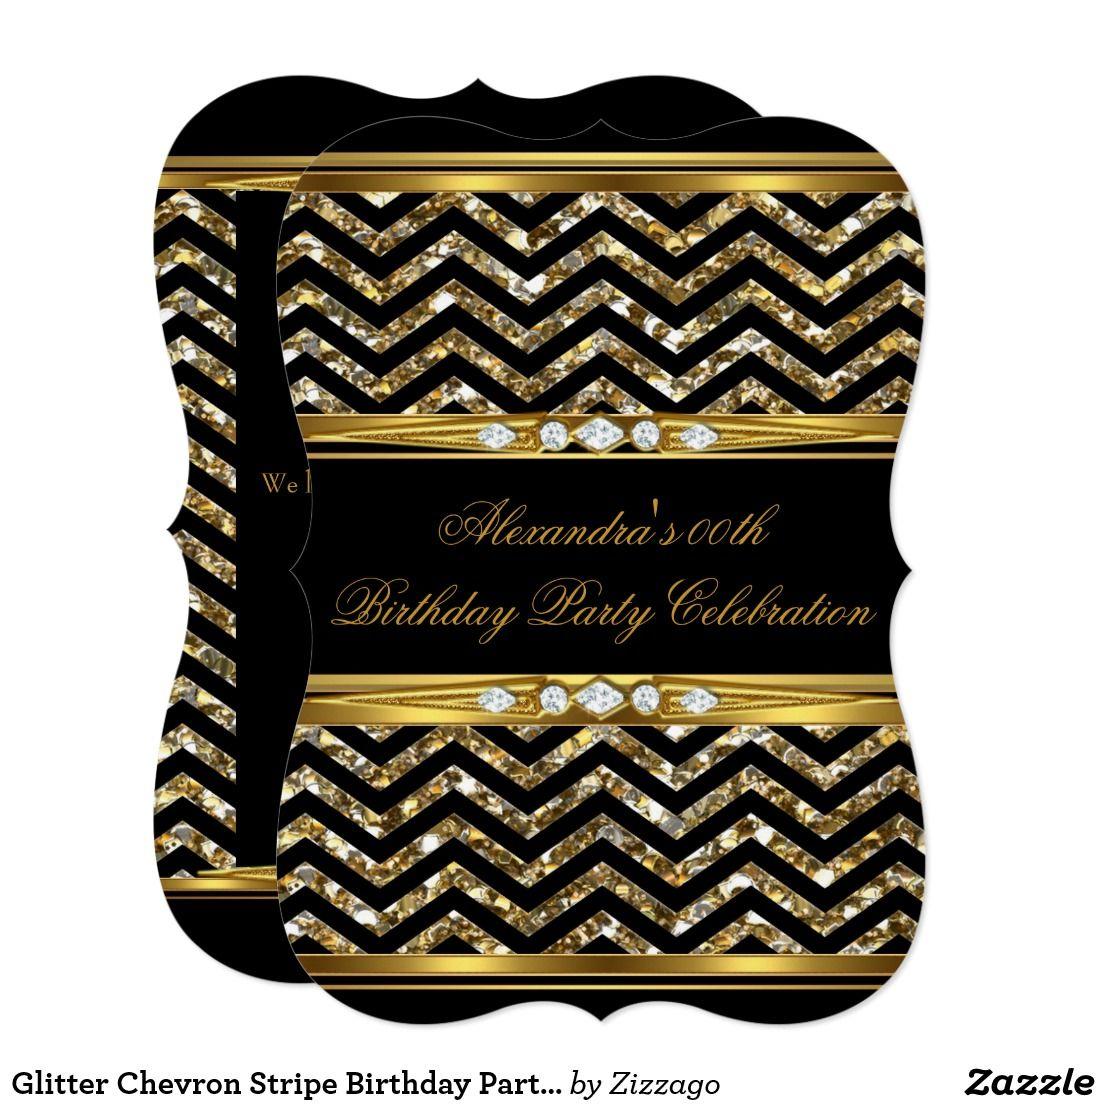 glitter chevron stripe birthday party gold black invitation in 2018